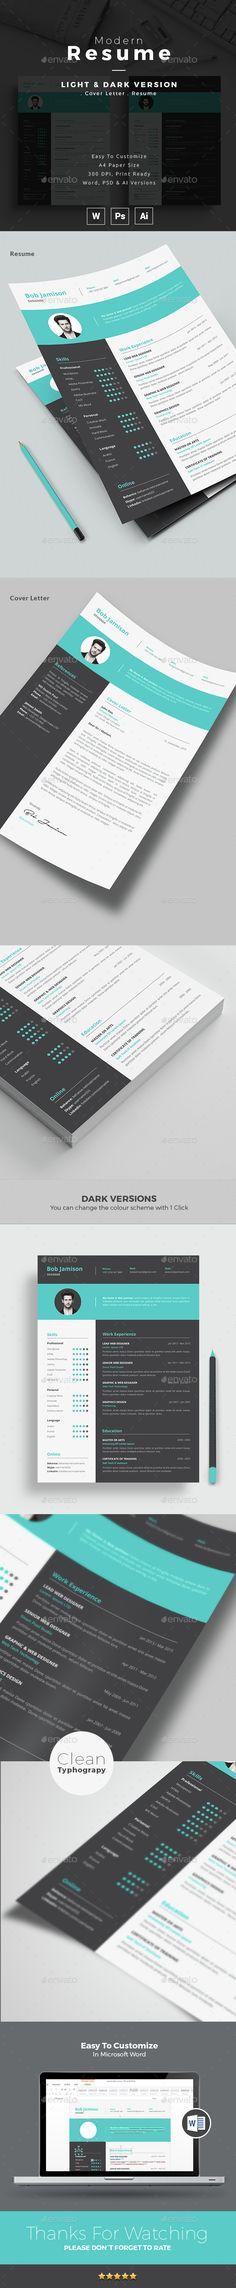 Modern Resume Template PSD, Vector AI. Download here: http://graphicriver.net/item/modern-resume/14779867?ref=ksioks